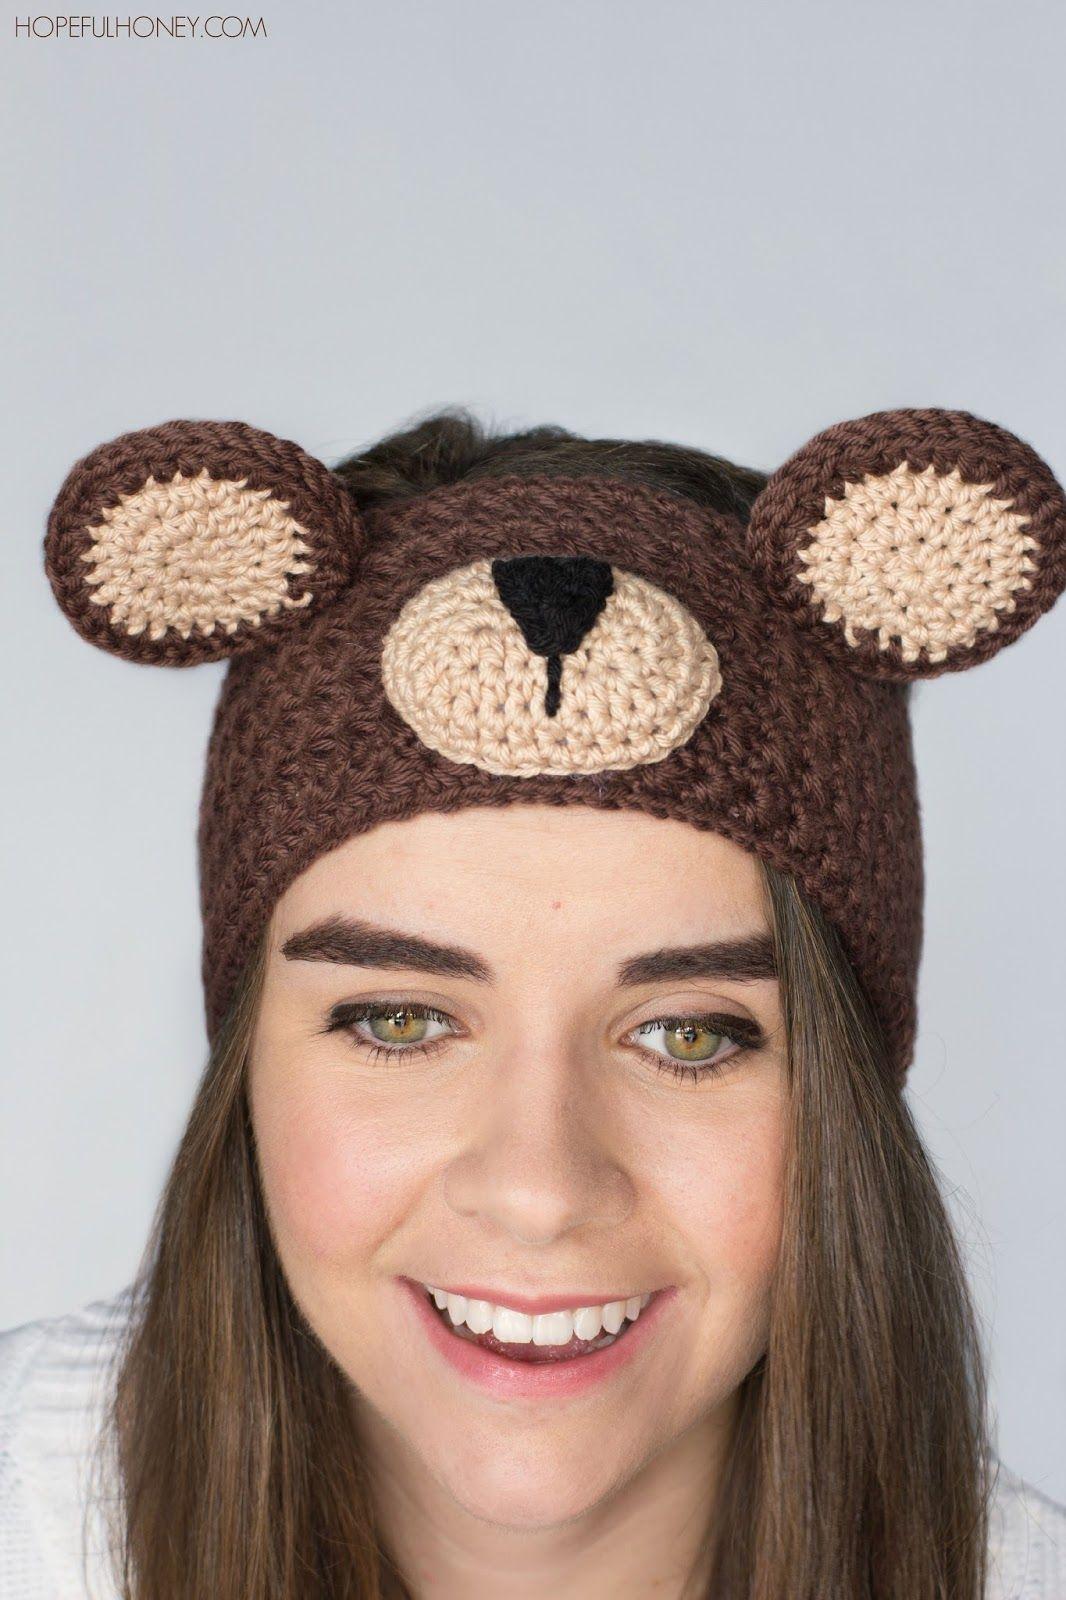 Teddy Bear Headband Crochet Pattern | Free crochet, Teddy bear and Bears